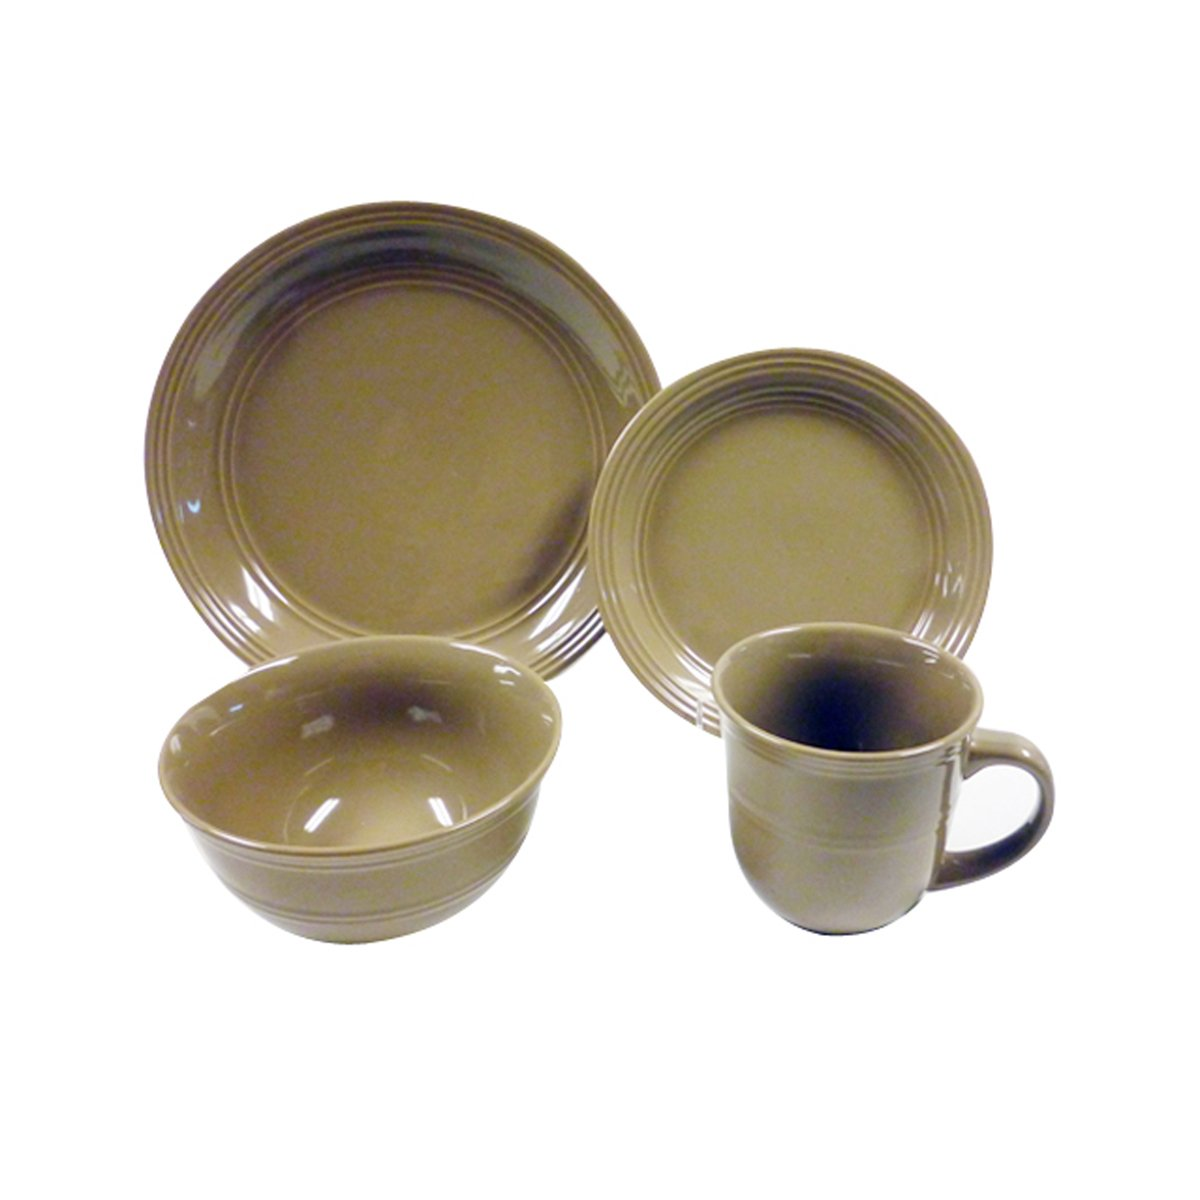 Vajilla cer mica beige 16 pzs fc 29664 sears com mx me for Vajilla ceramica